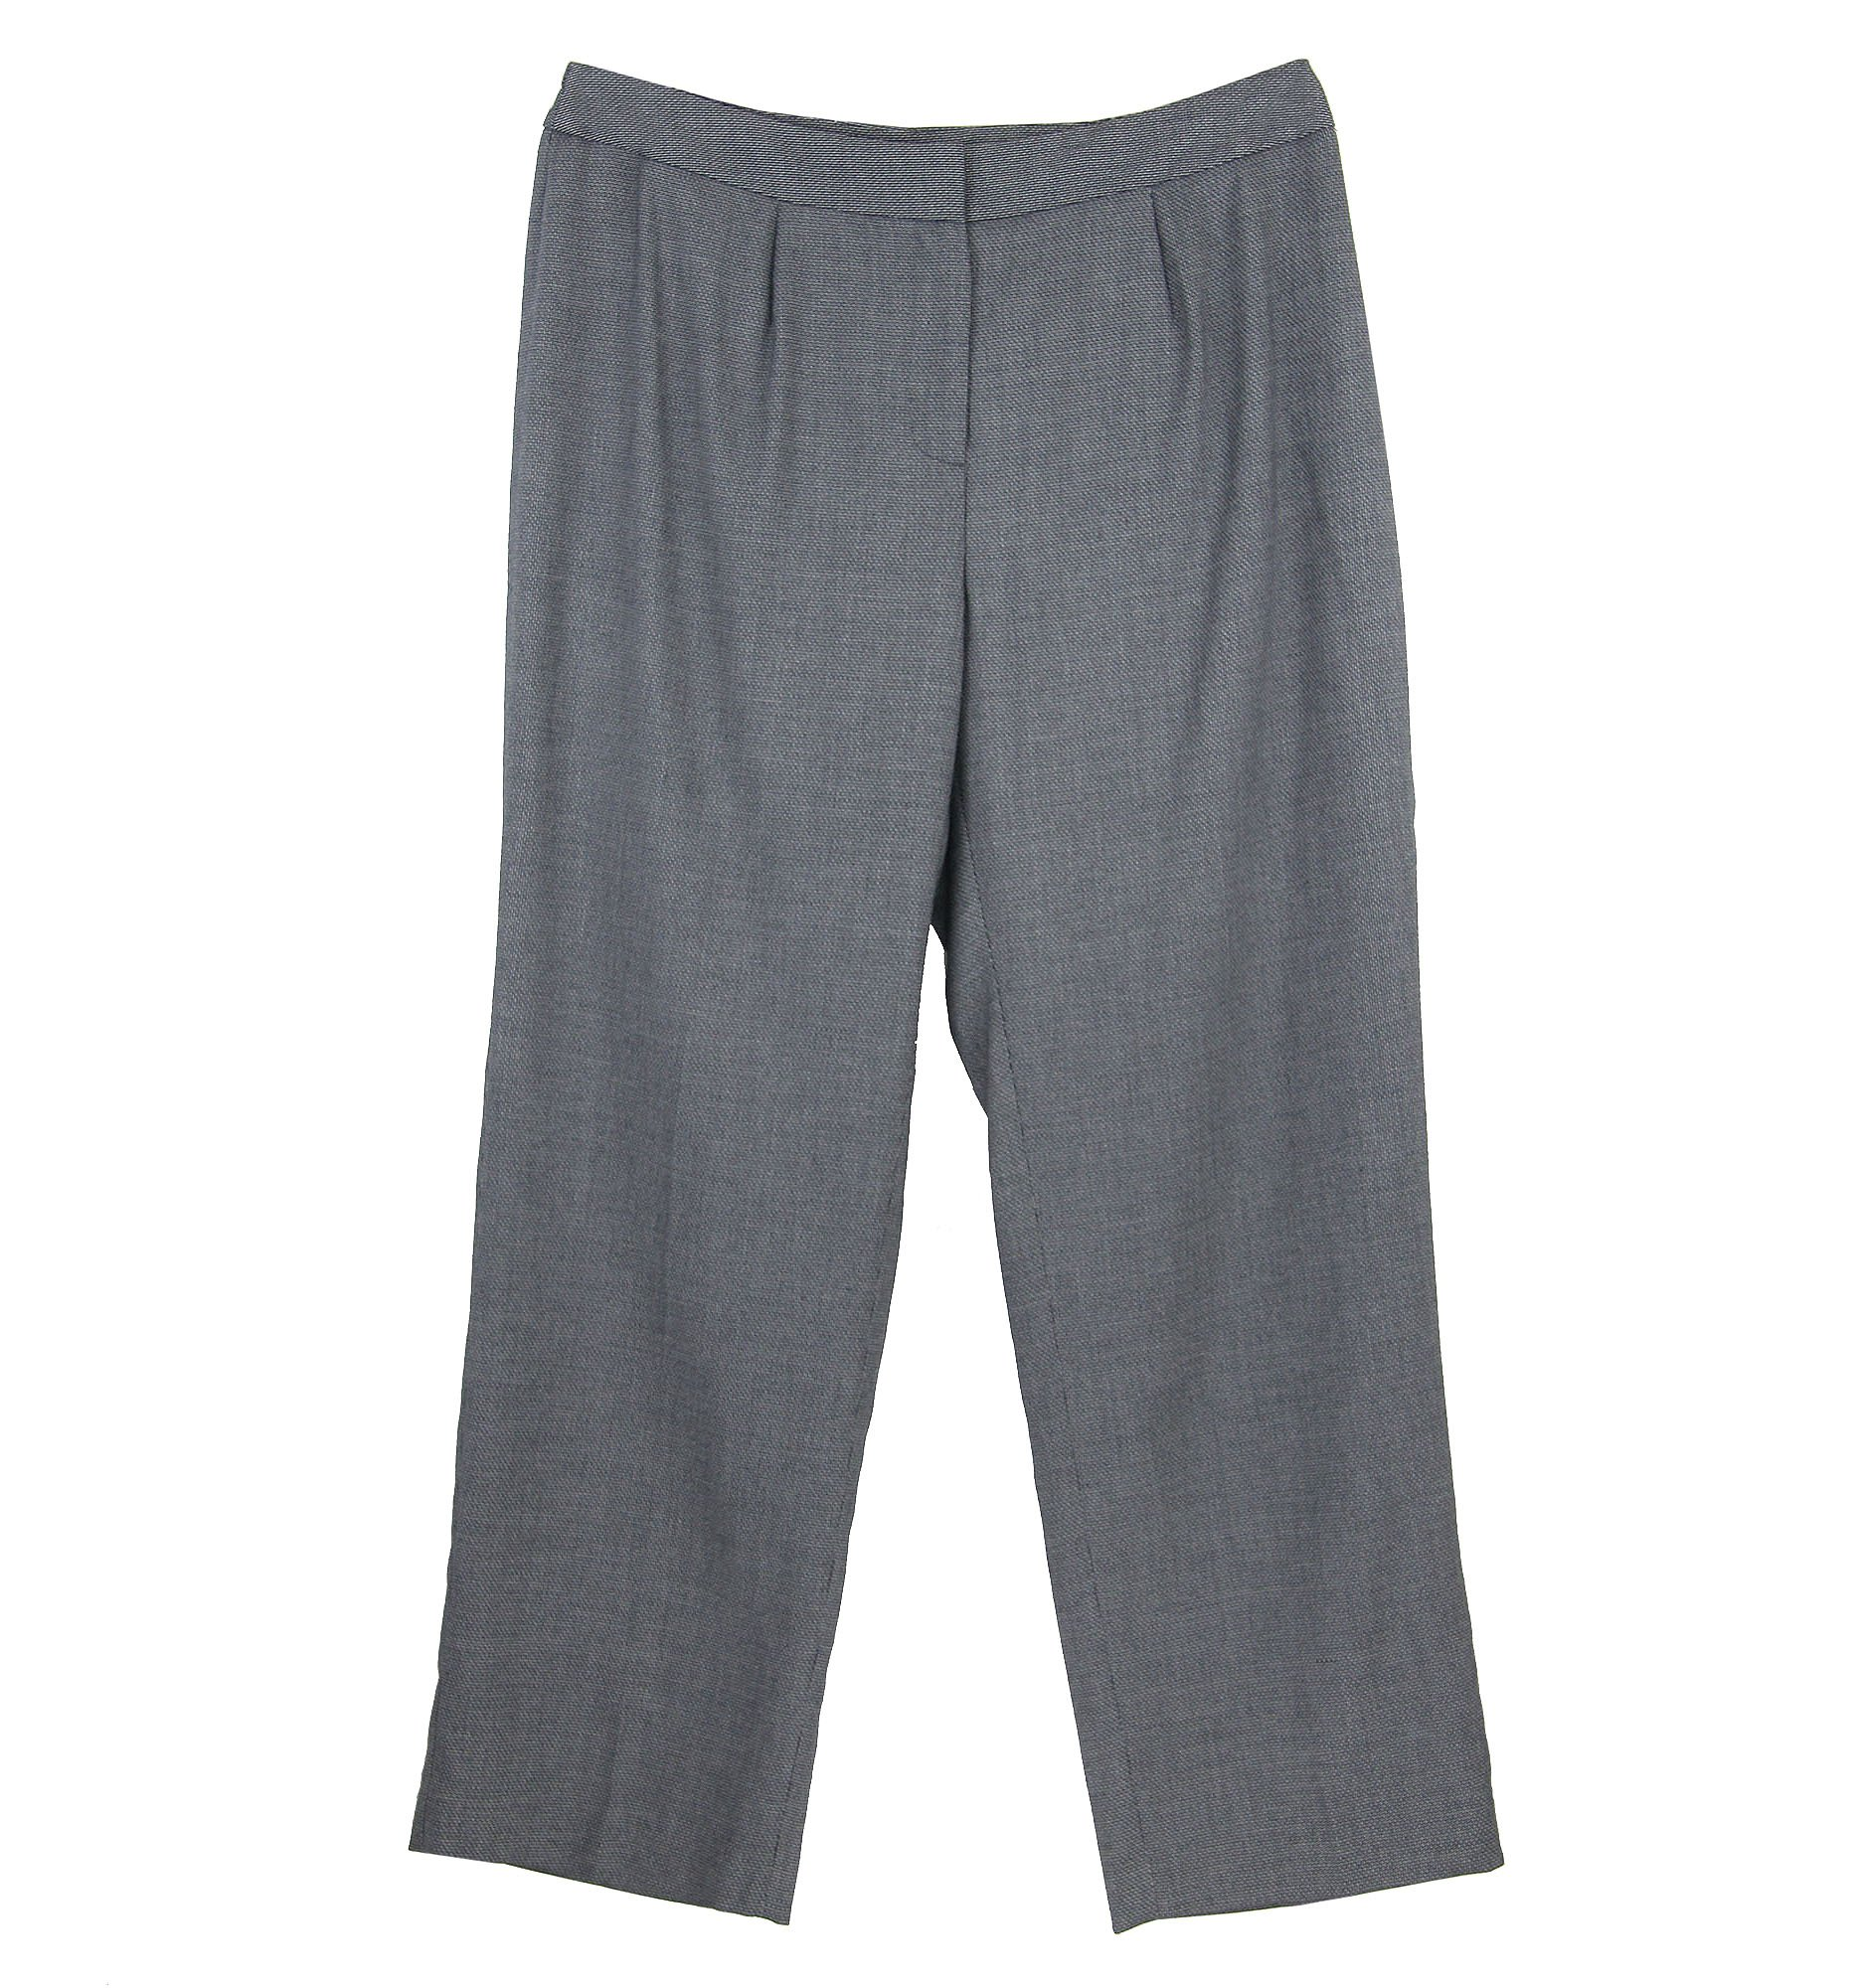 Jones New York Women's Plus Straight Leg Dress Pants 14w Petite Platinum